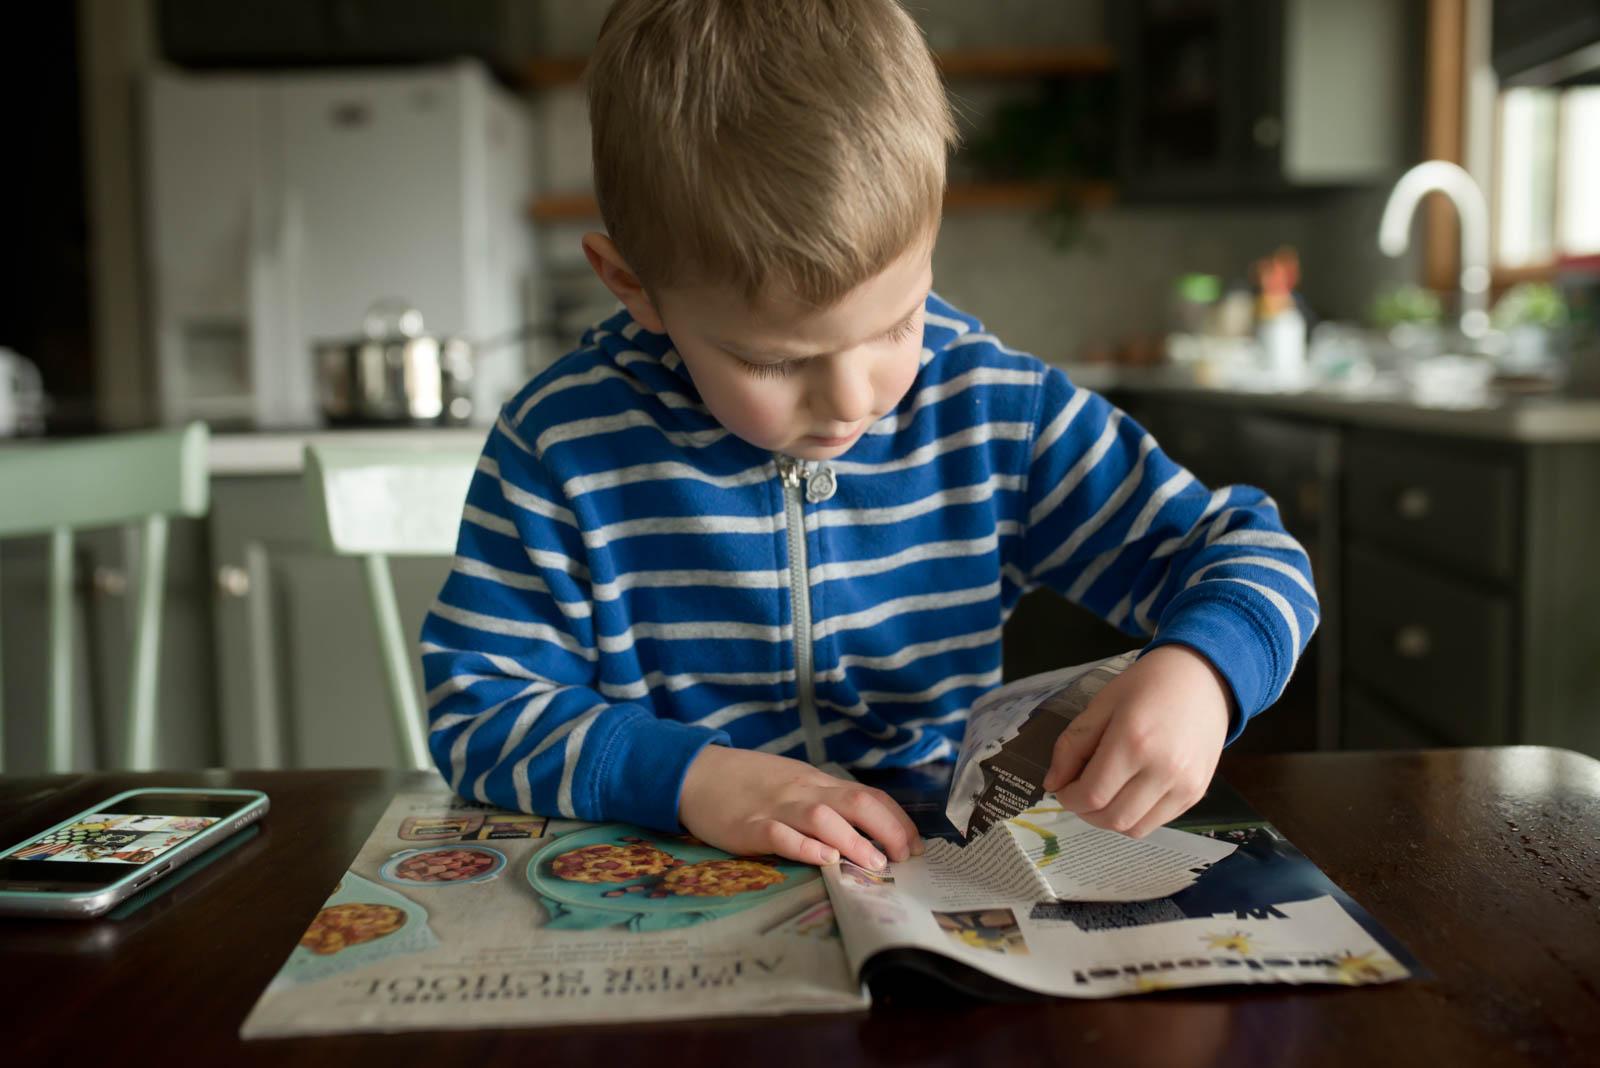 Magazine Scavenger Hunt With Paper Tearing Web Mix Marketing